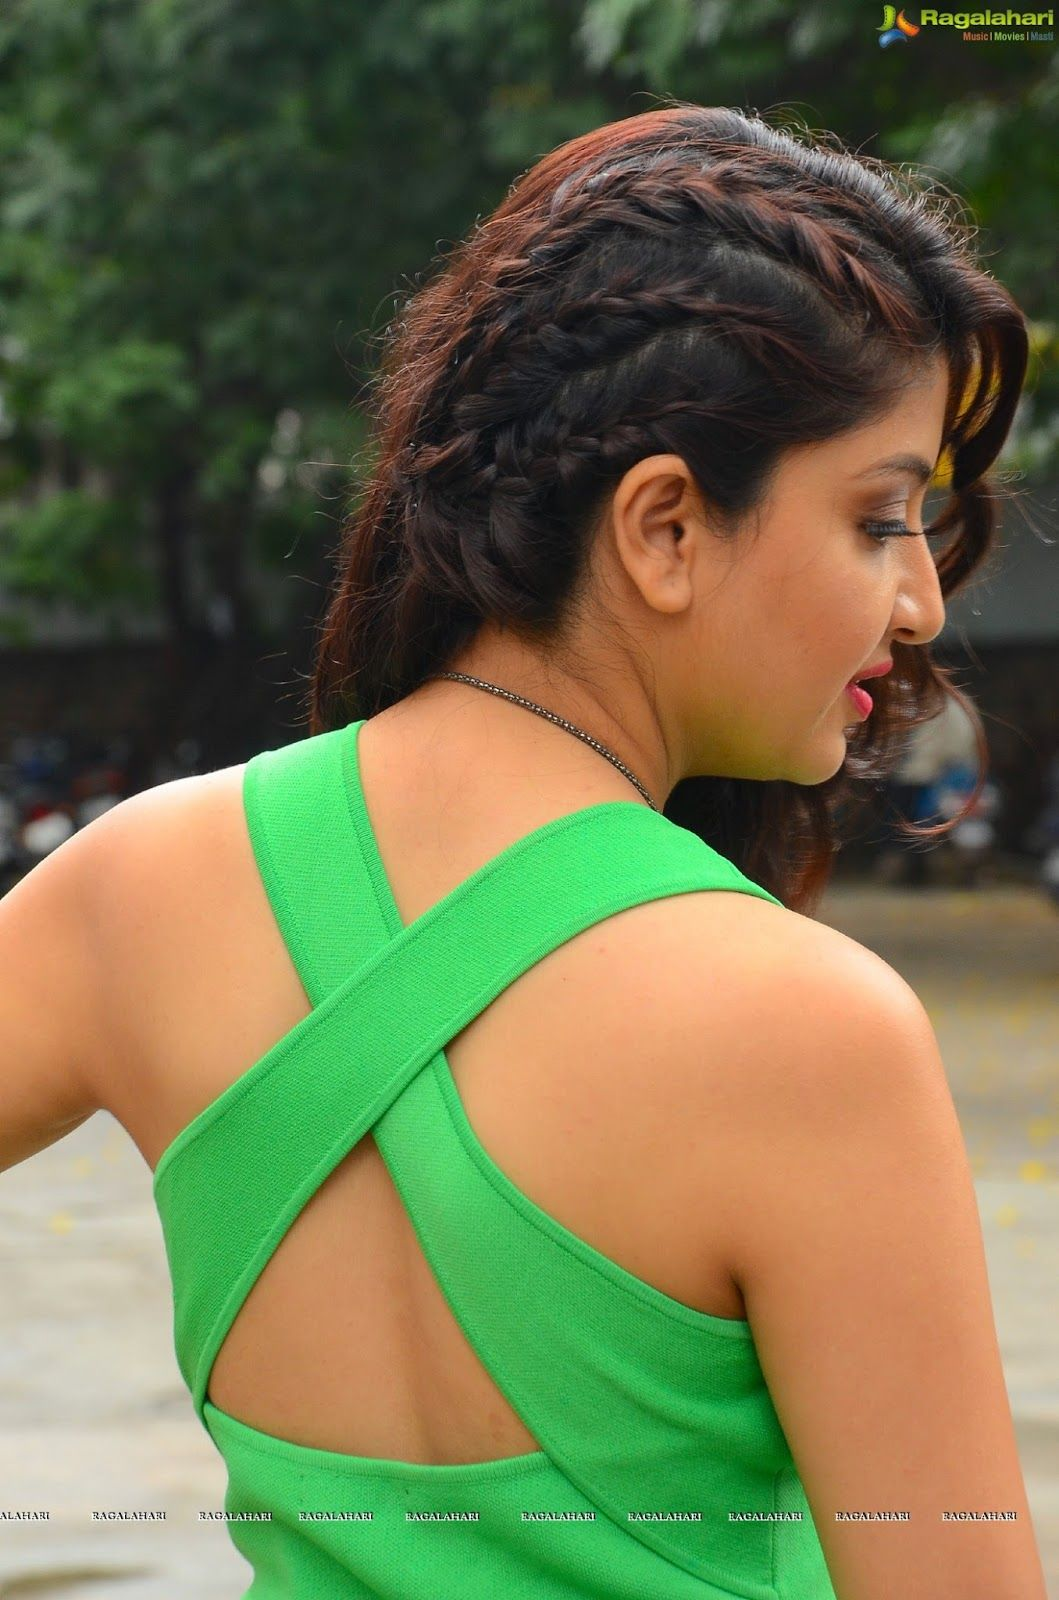 South Indian Actress Poonam Kaur Pics Poonam Kaur Images Poonam